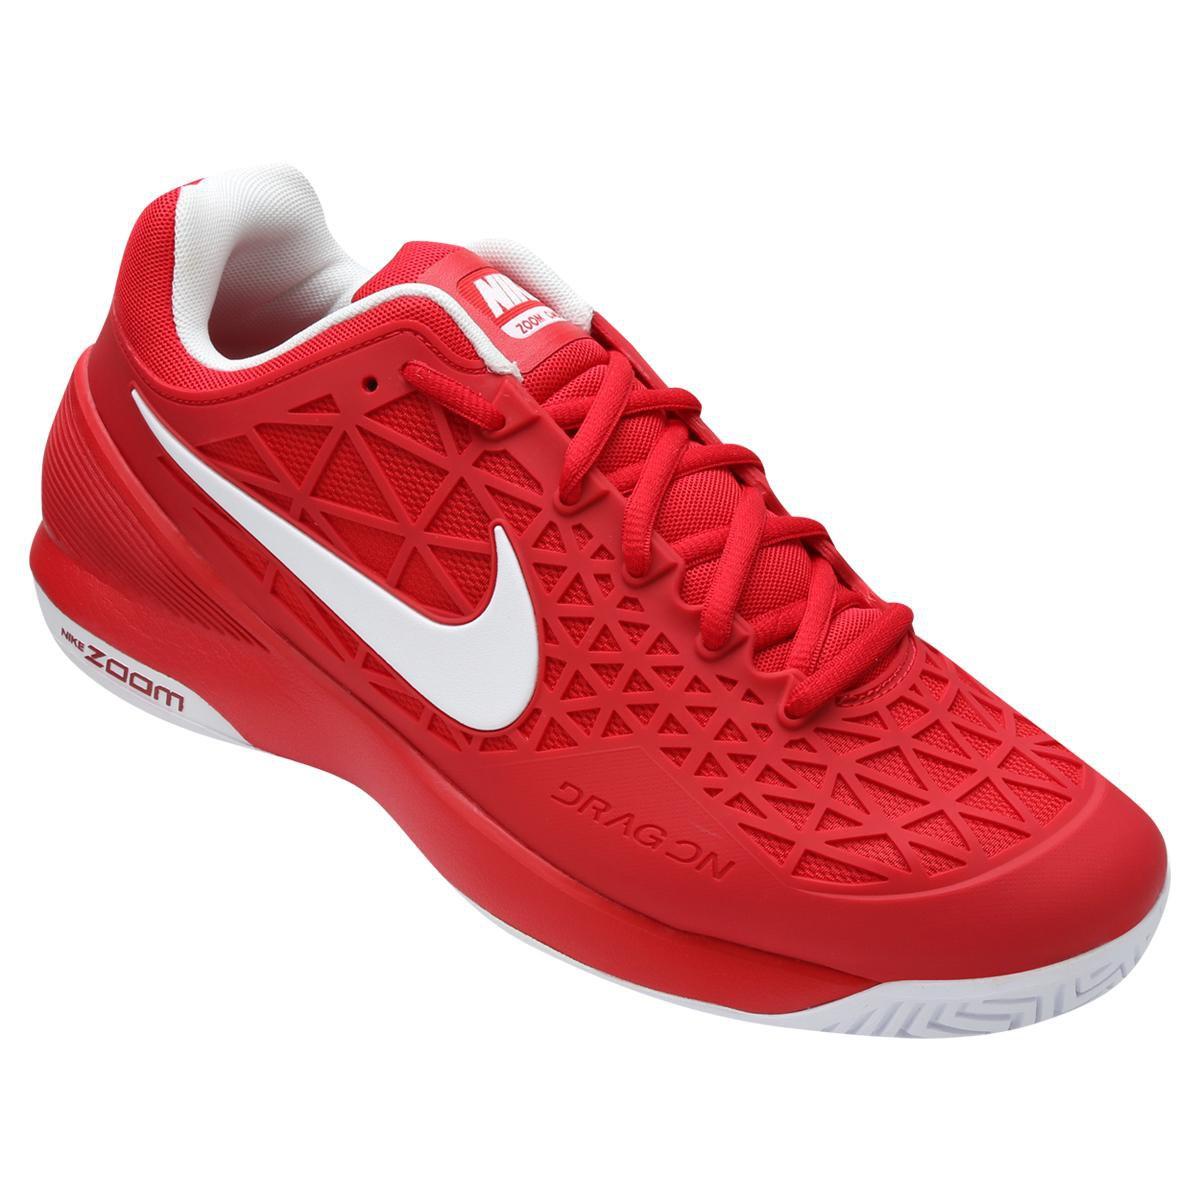 5202bc3f1b5 Tênis Nike Zoom Cage 2 Masculino - Compre Agora